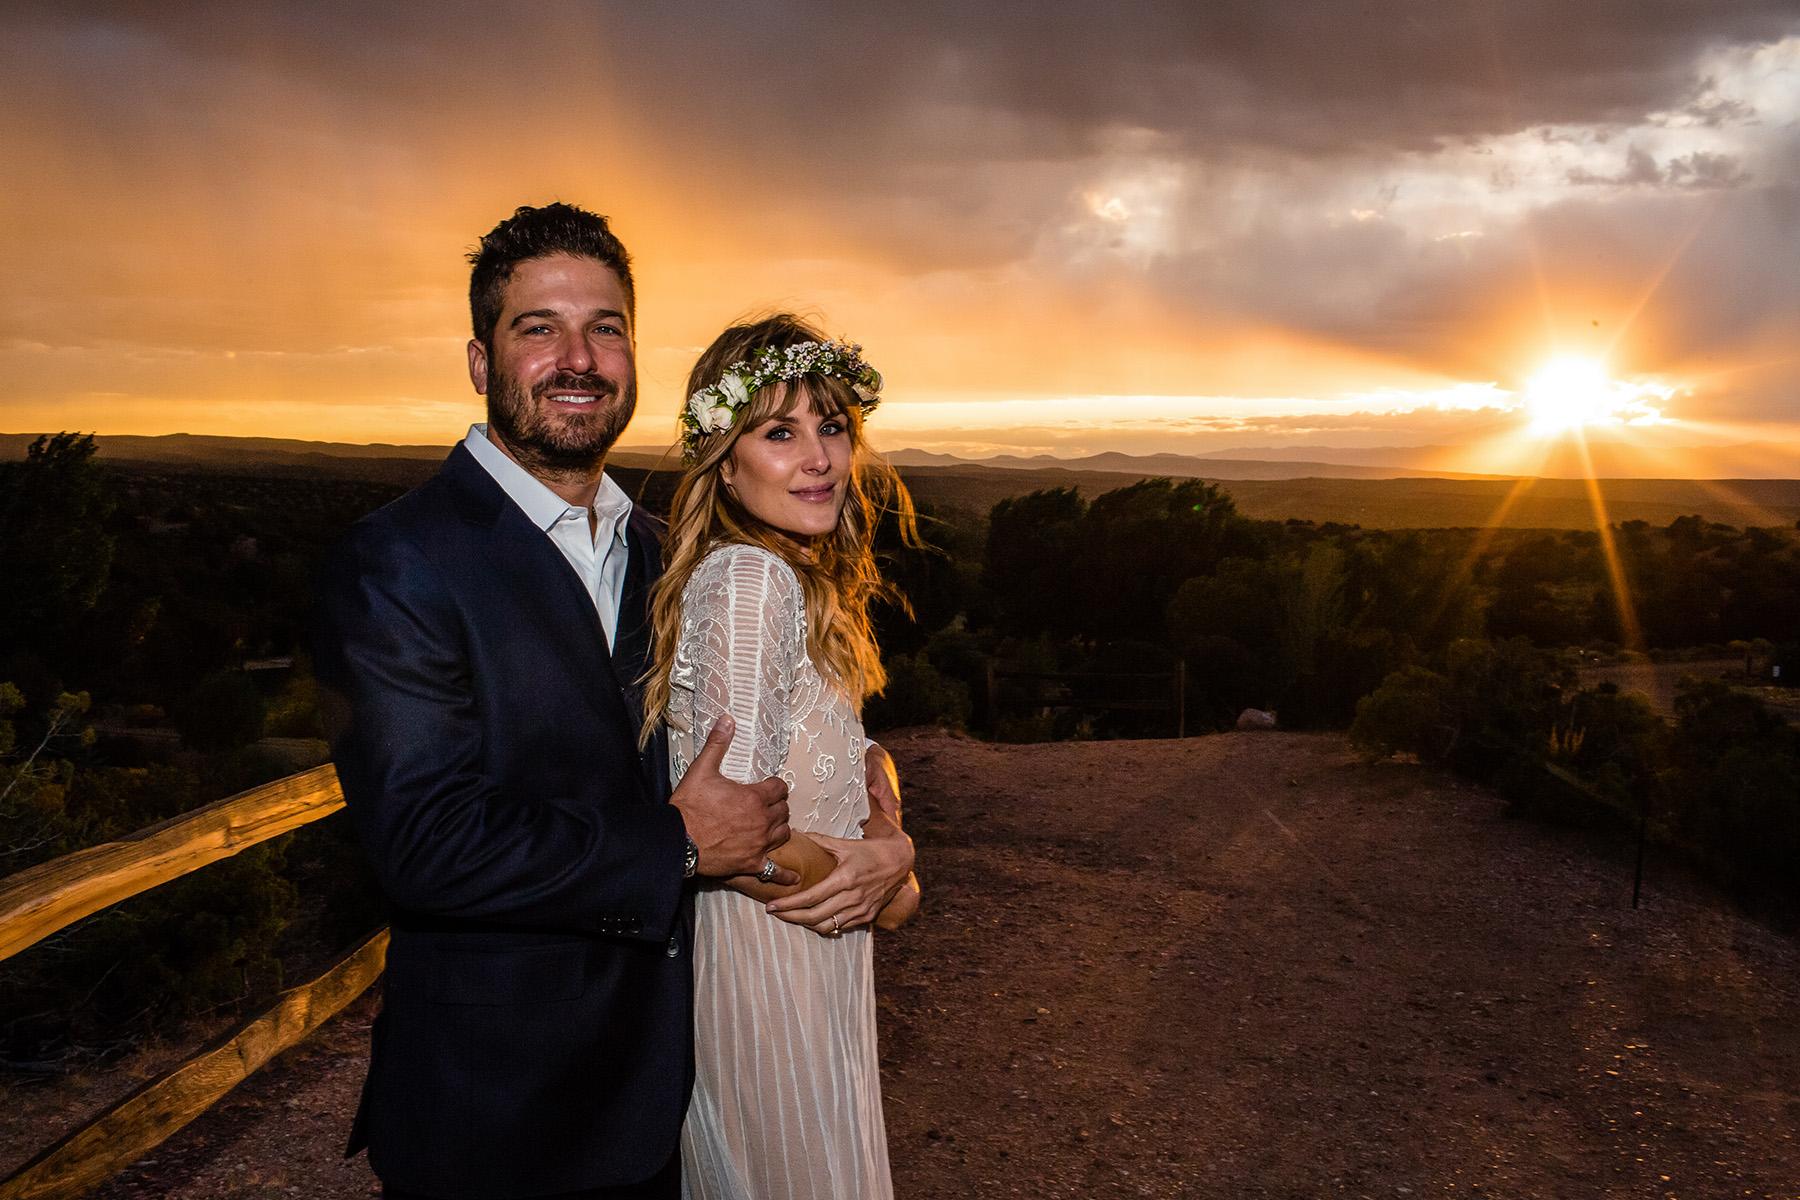 Melinda-Dustin-wedding-four-seasons-resort-santa-fe-new-mexico-1025